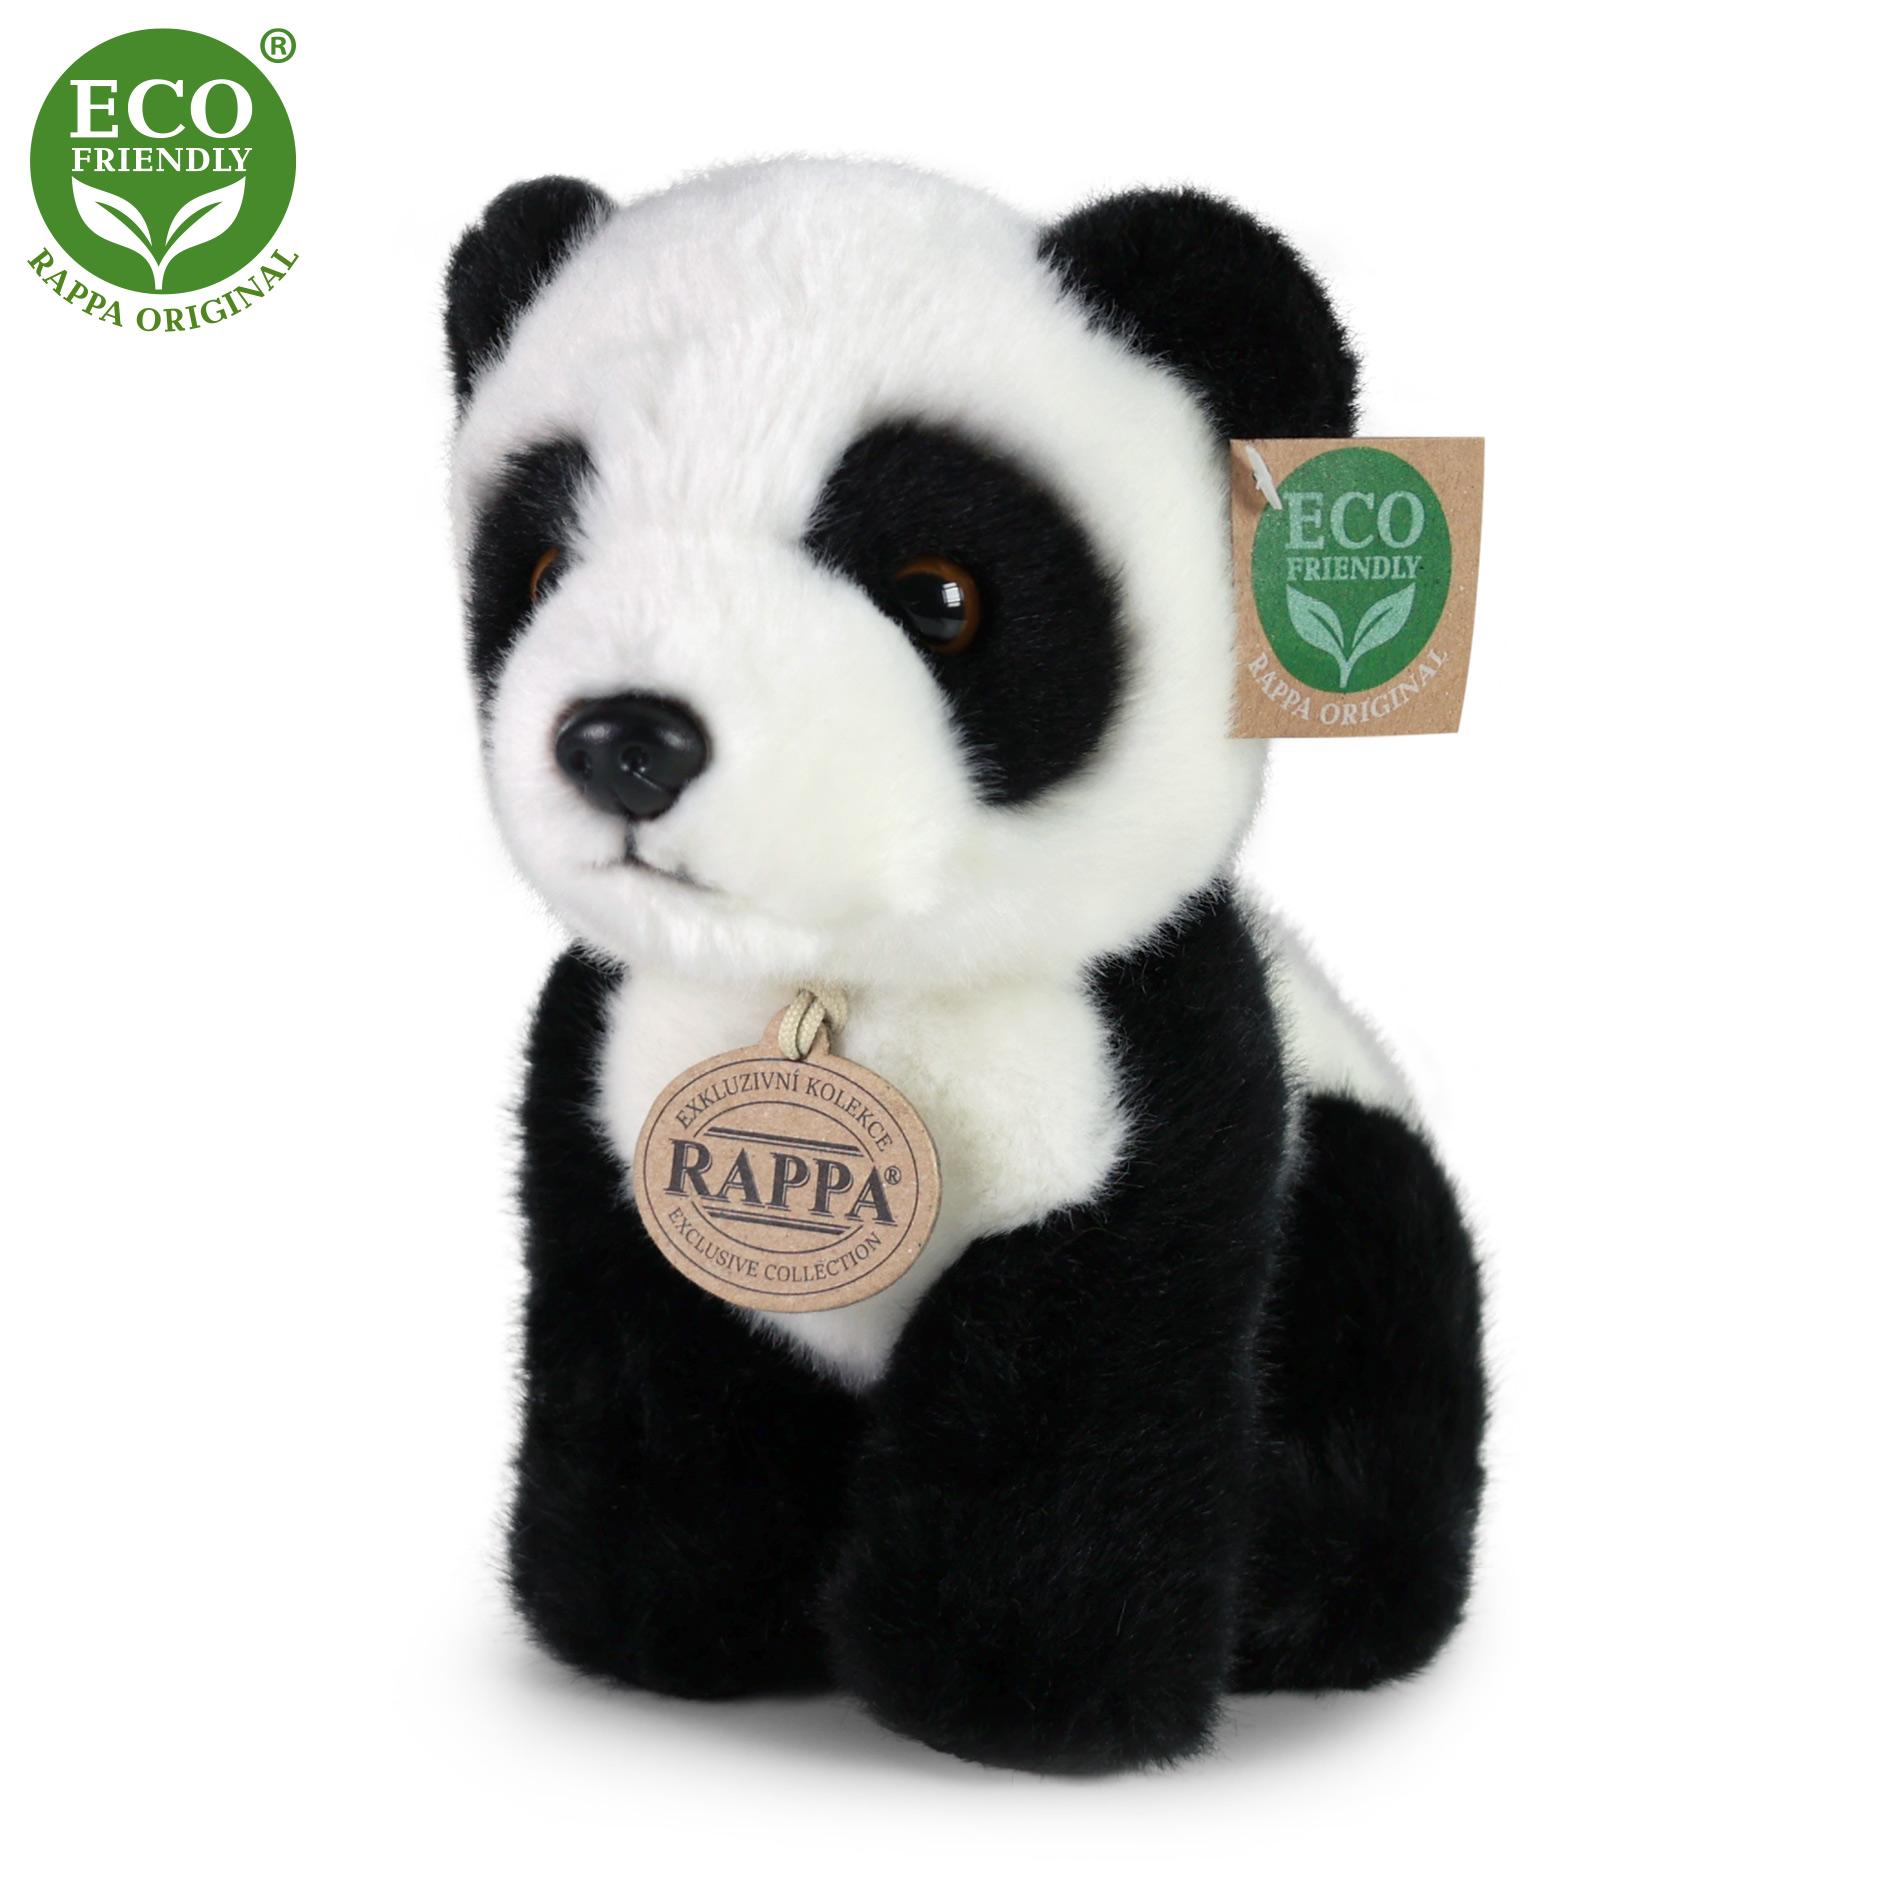 plyšová panda sediaci, 18 cm